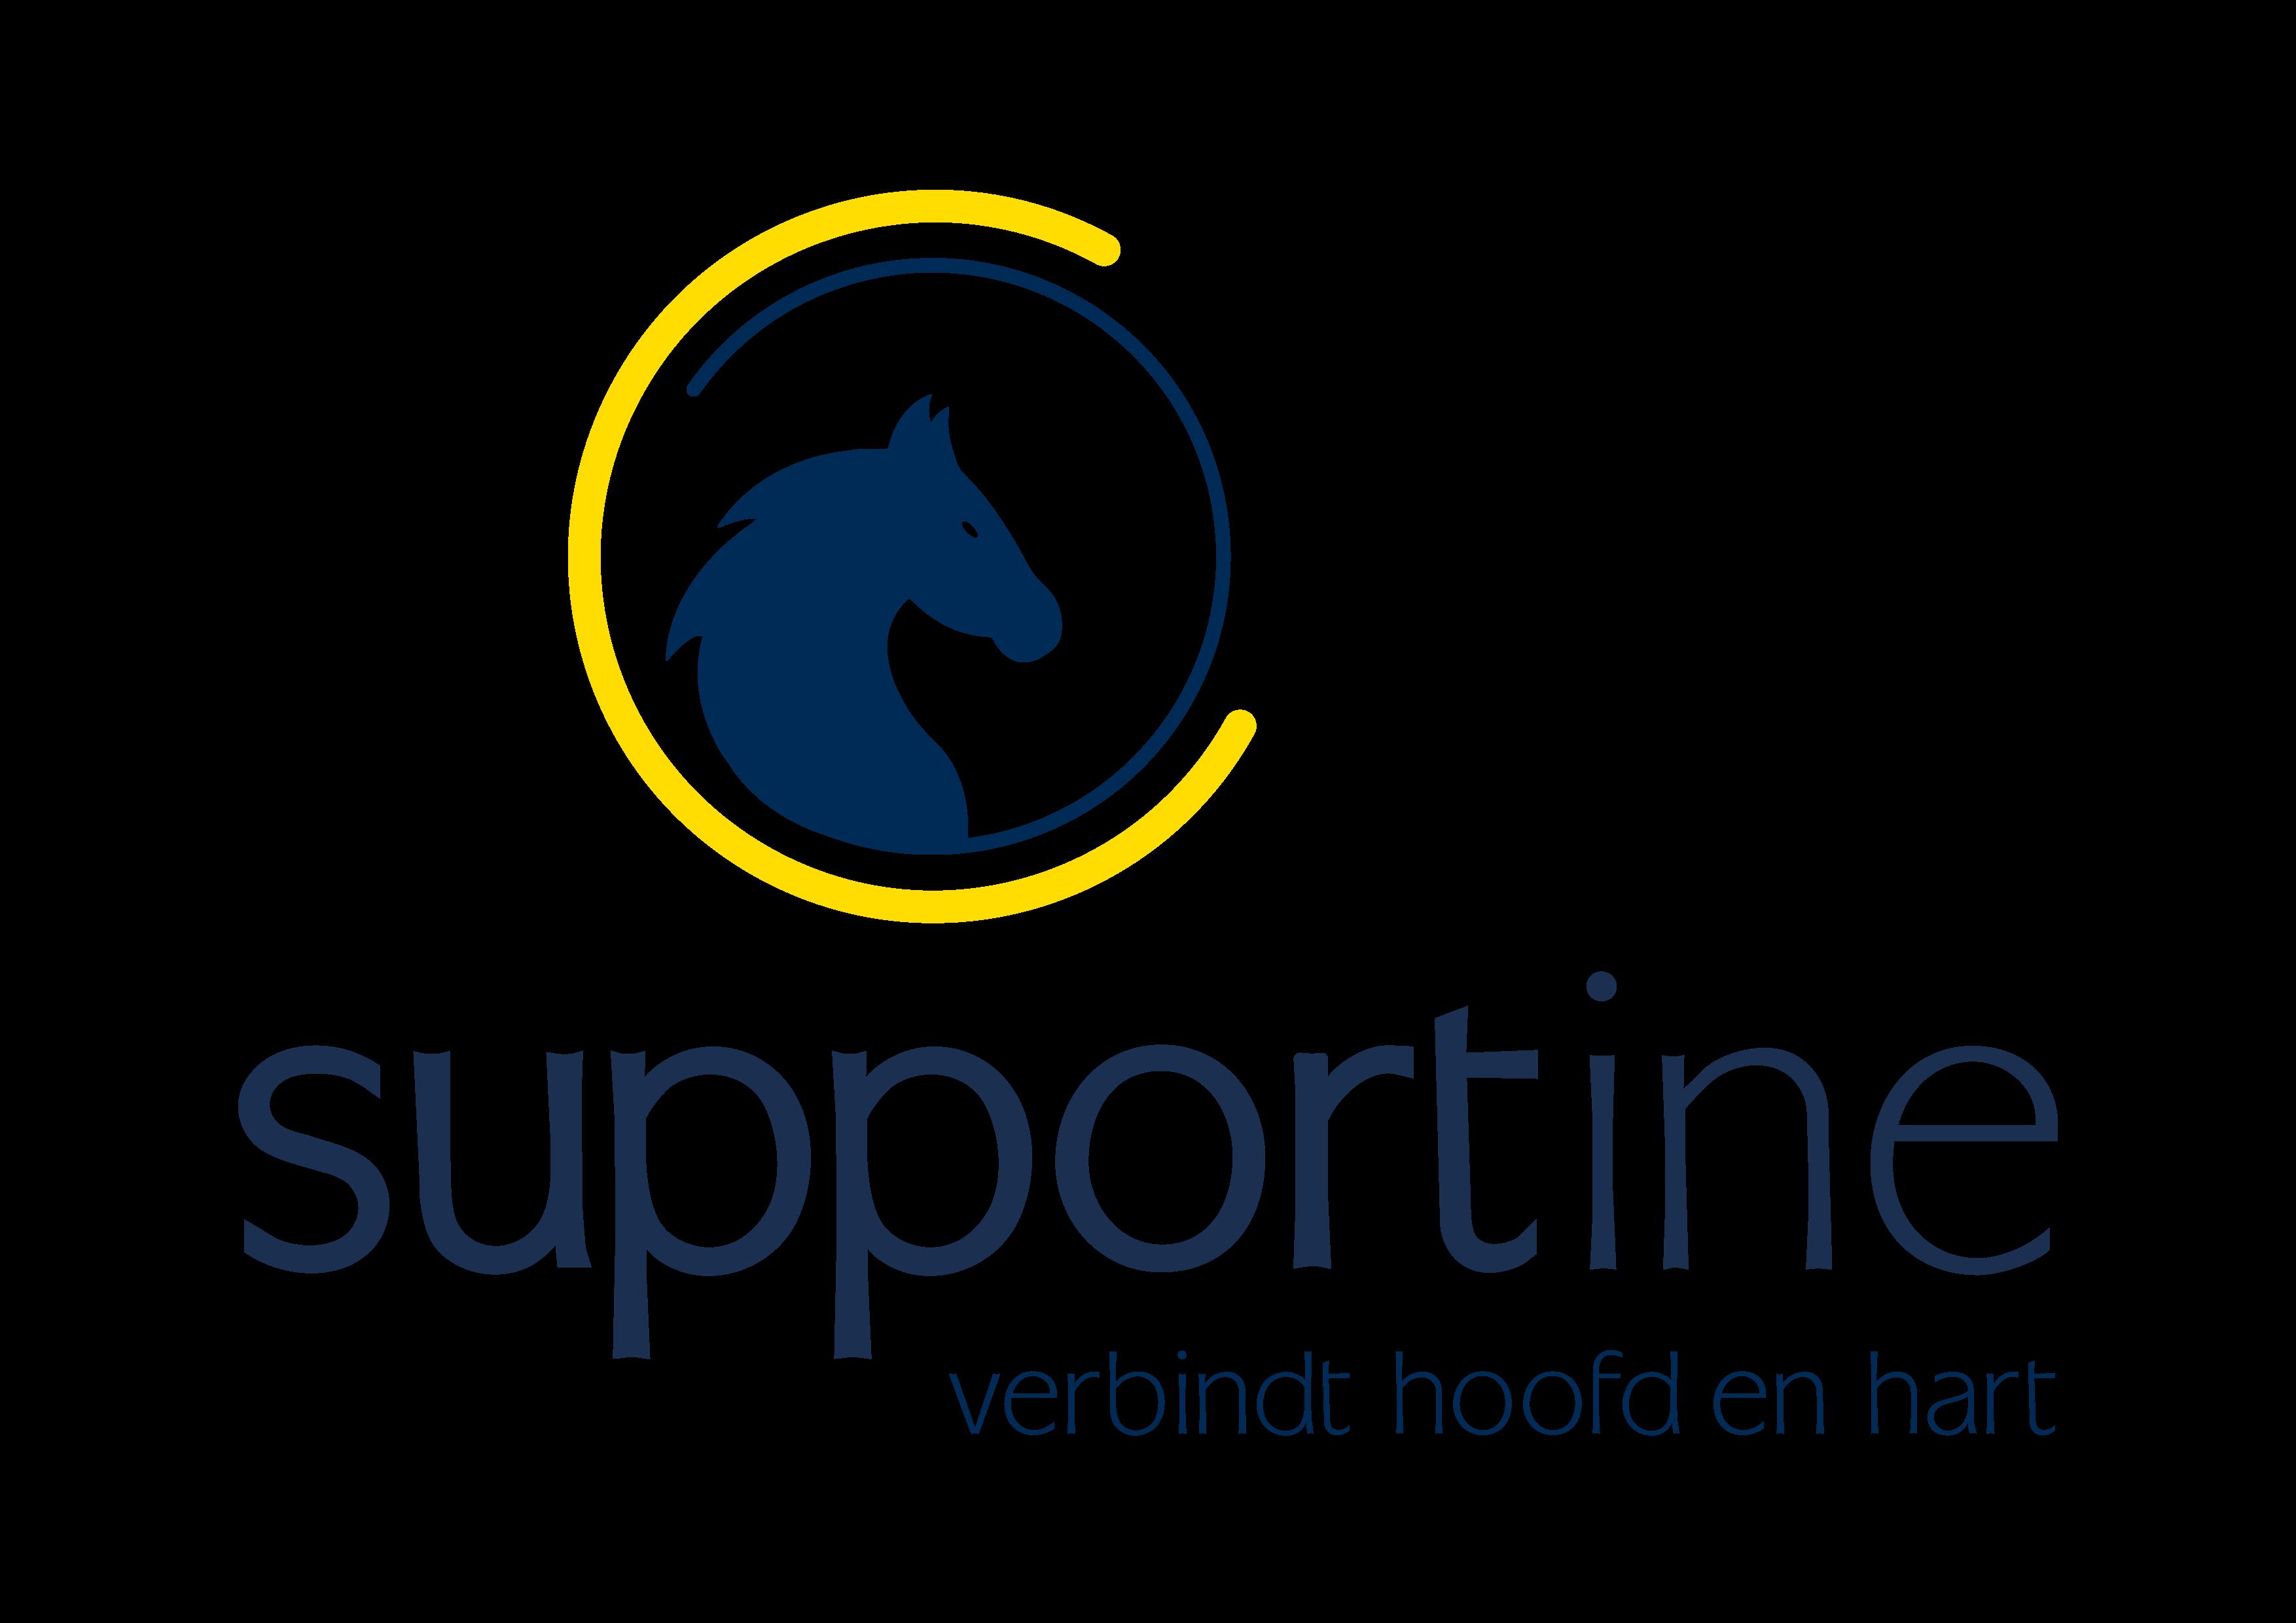 Supportine